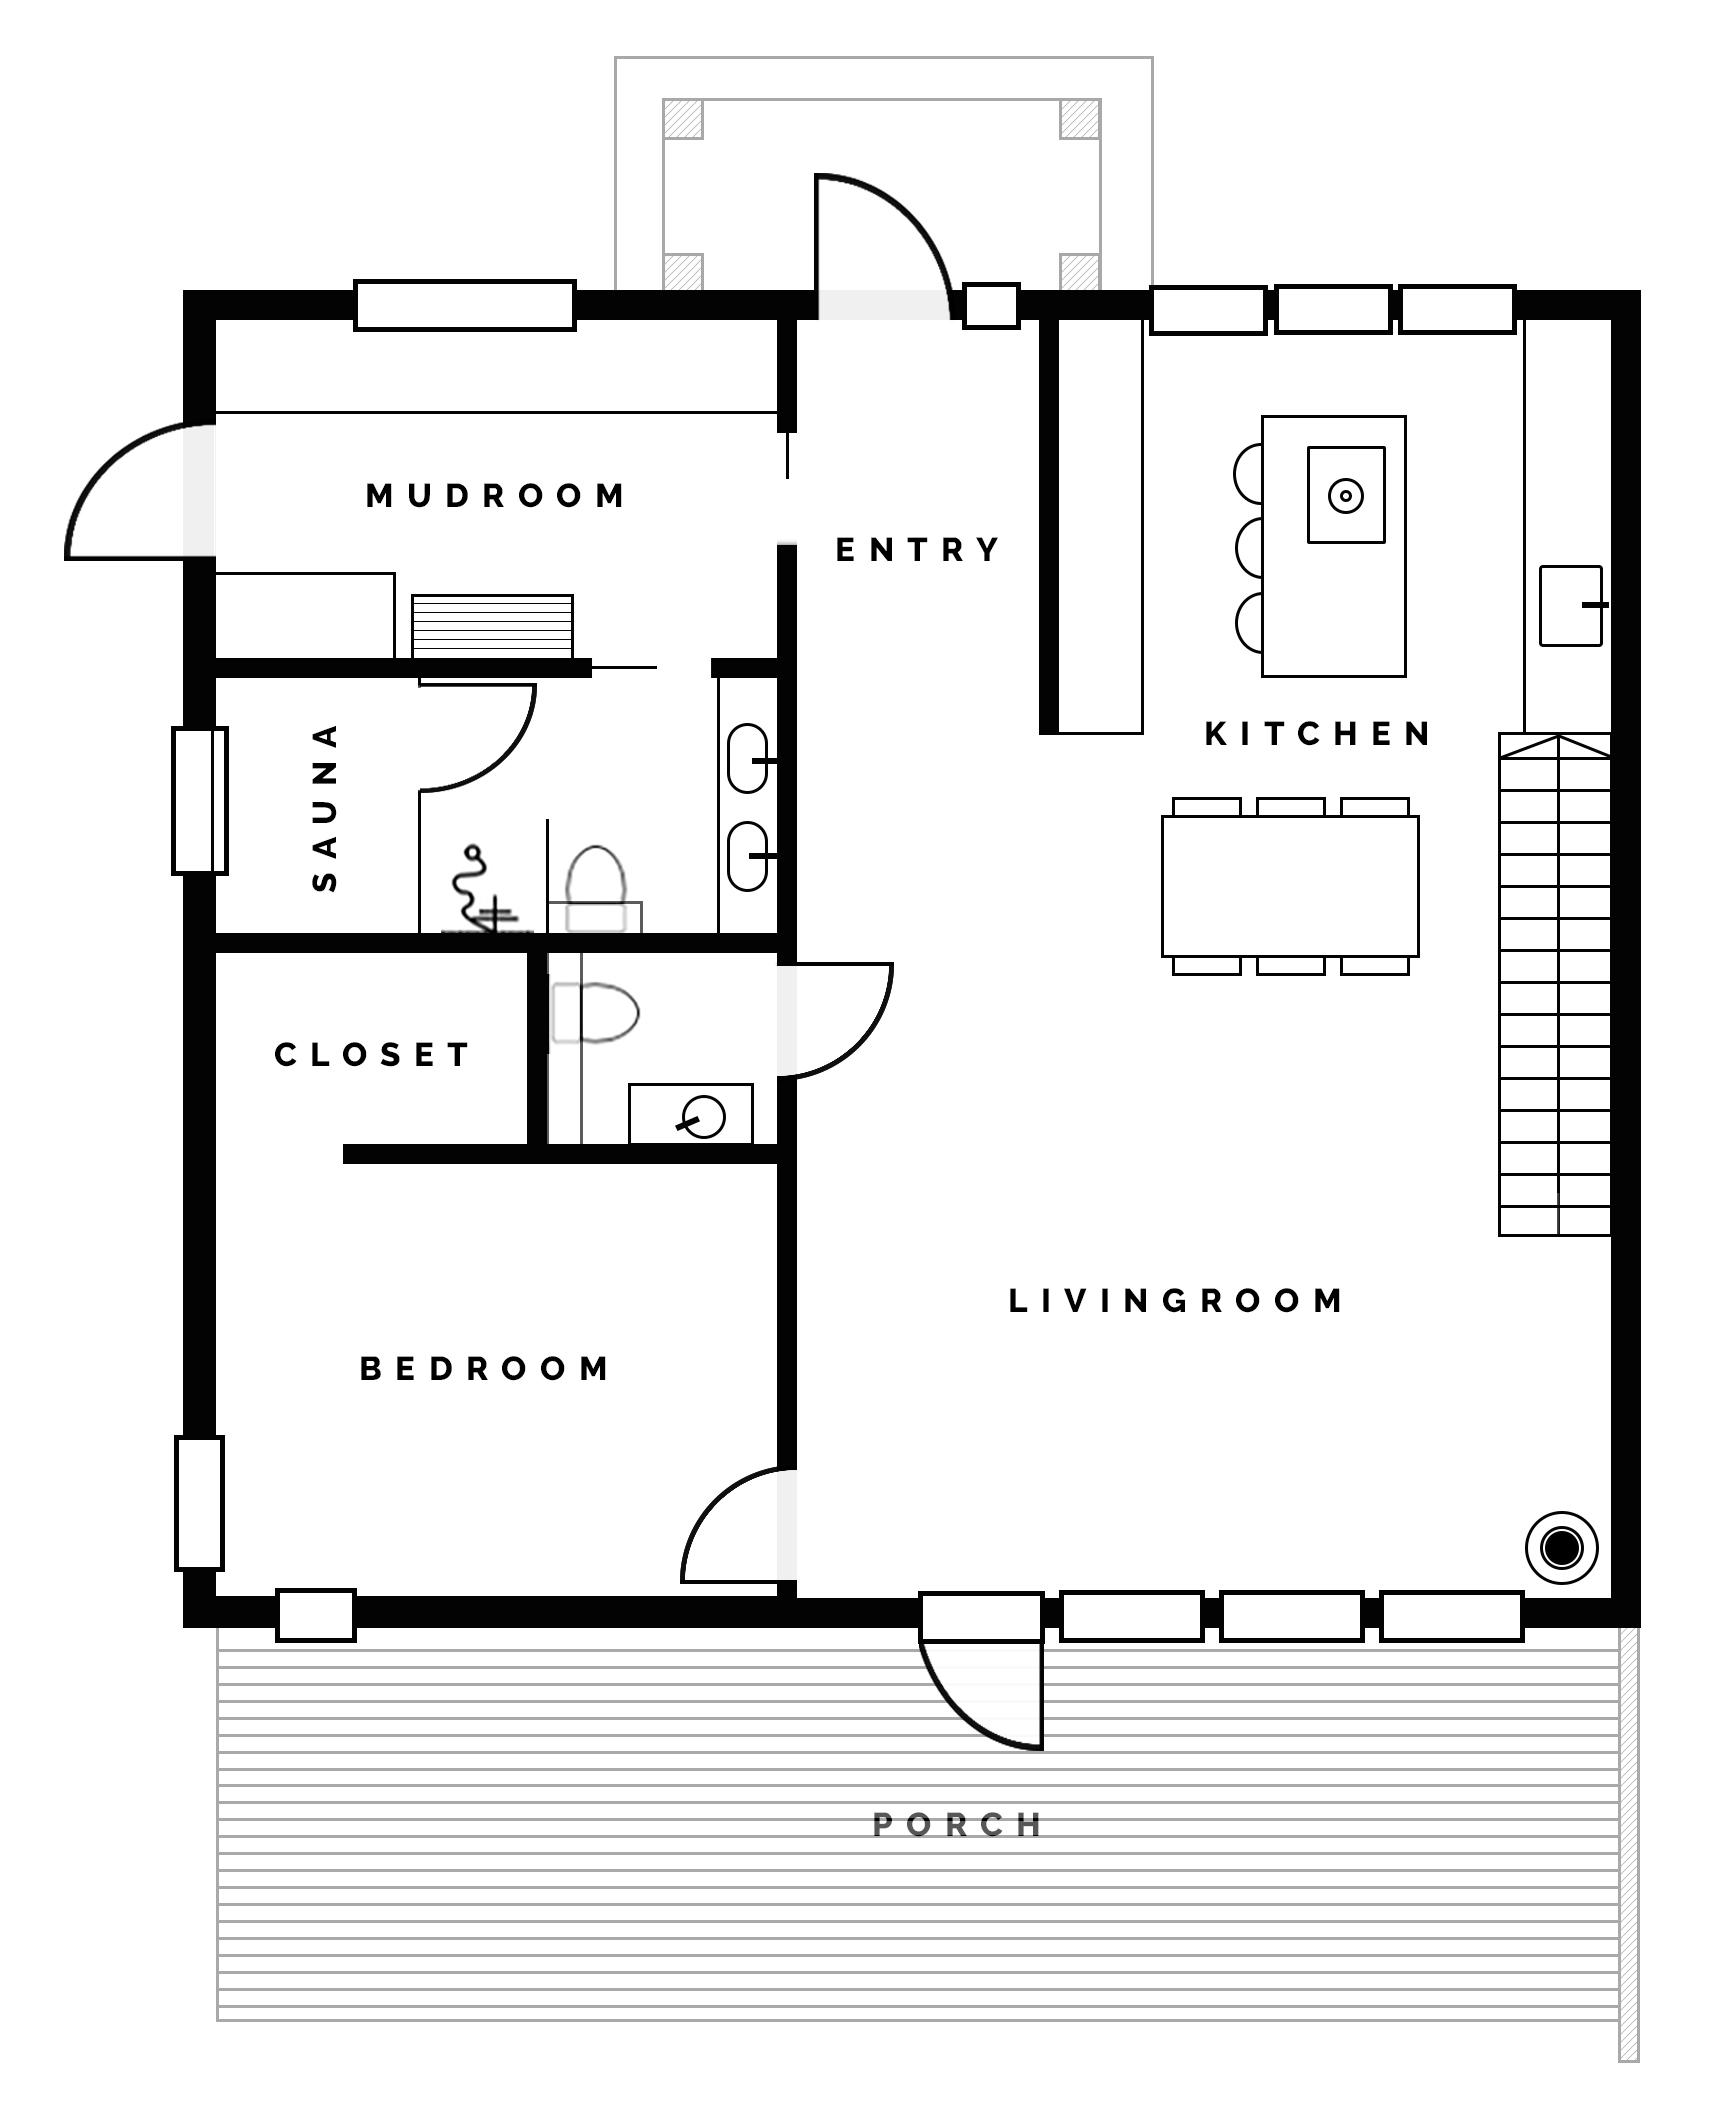 House Master Plan / By Sandramaria / Sandramarias.com